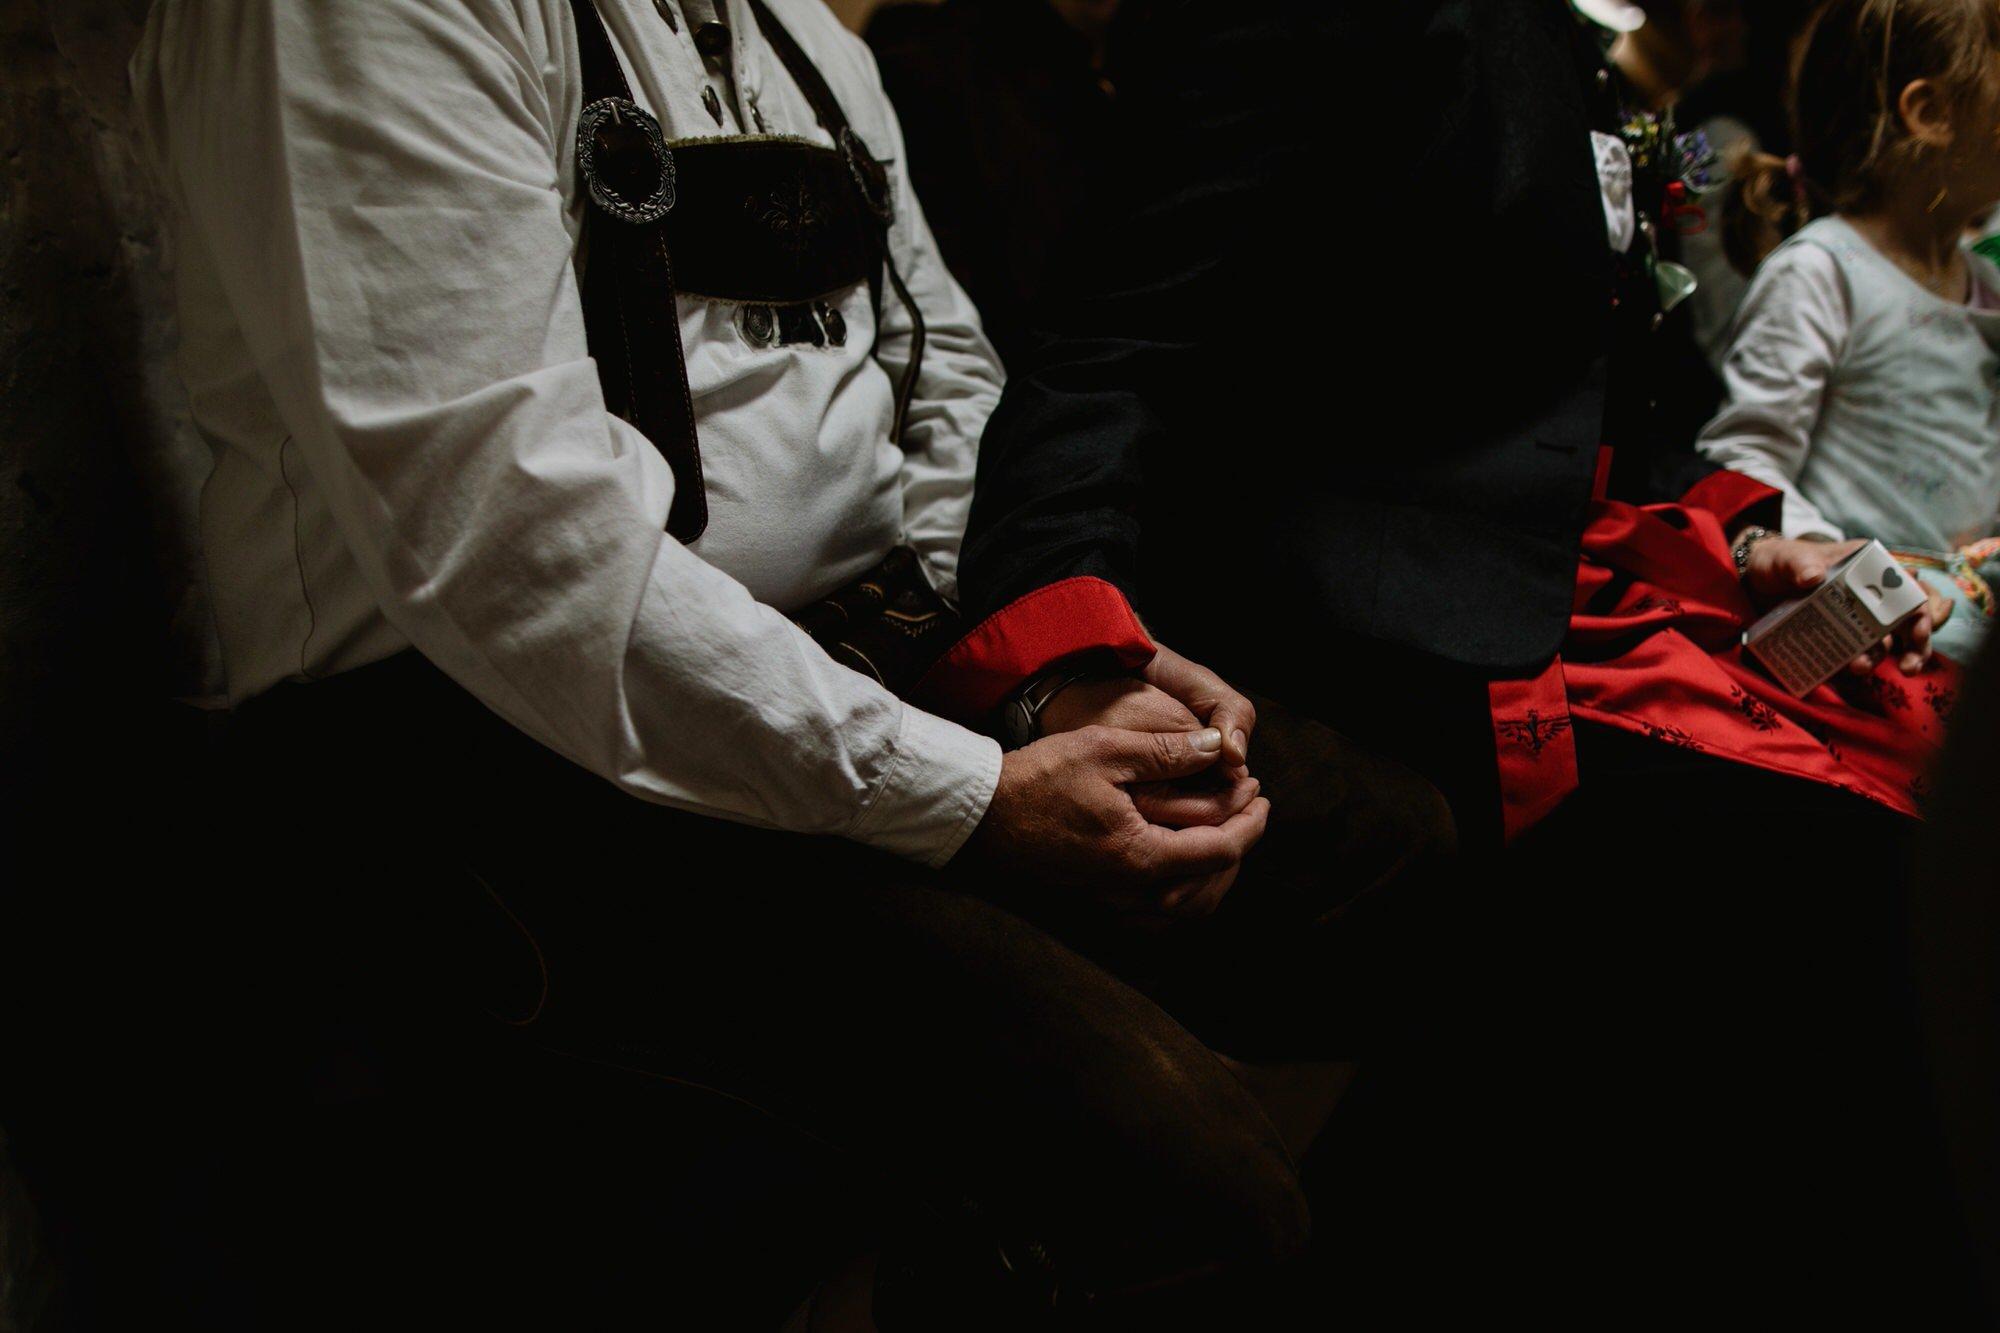 023 TIN SHED KNOCKRAICH WEDDING AUSTRIAN SCOTTISH ZOE ALEXANDRA PHOTOGRAPHY